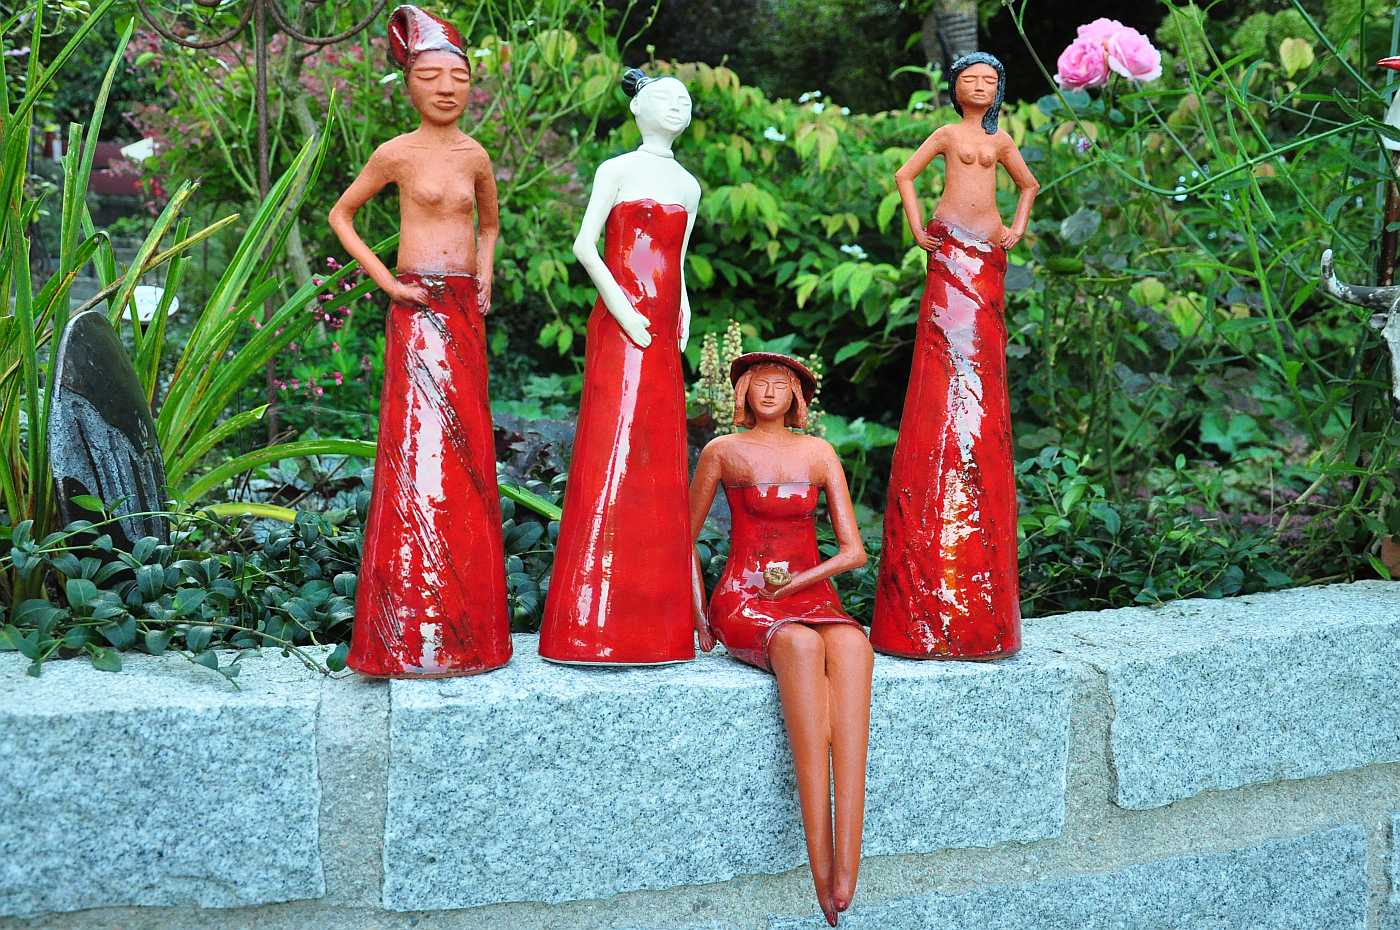 Rote Mädels im Keramikgarten